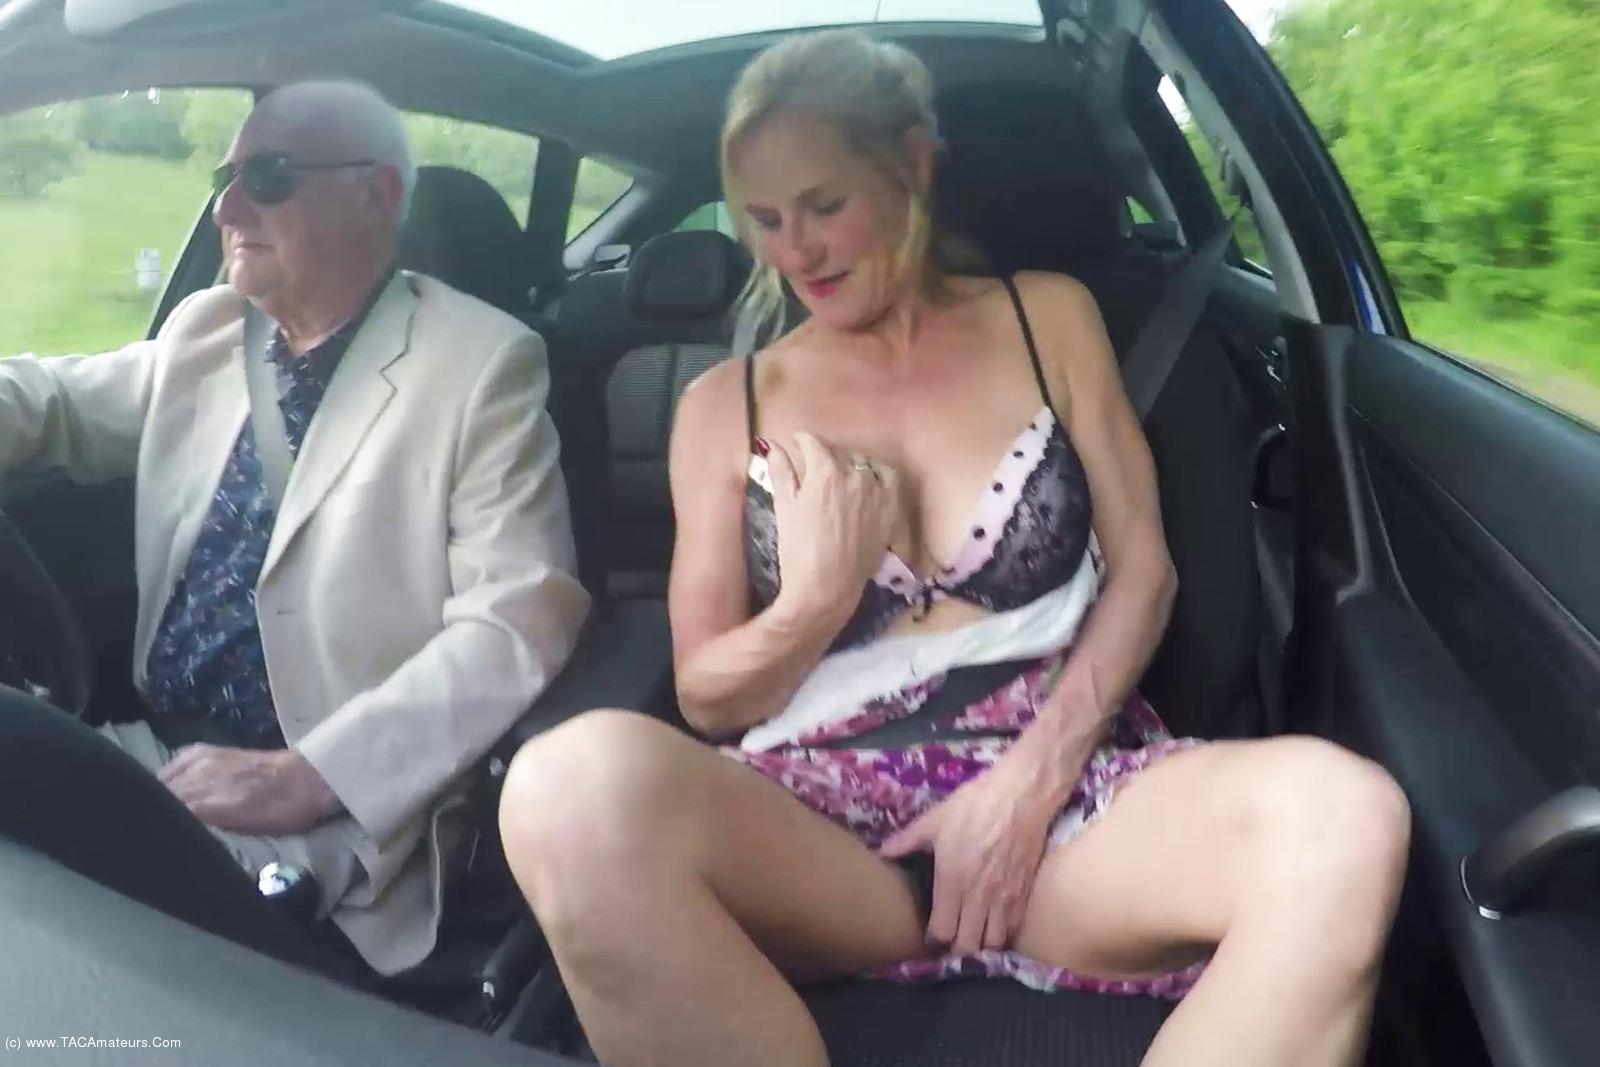 MollyMILF - Flashing In The Car scene 2